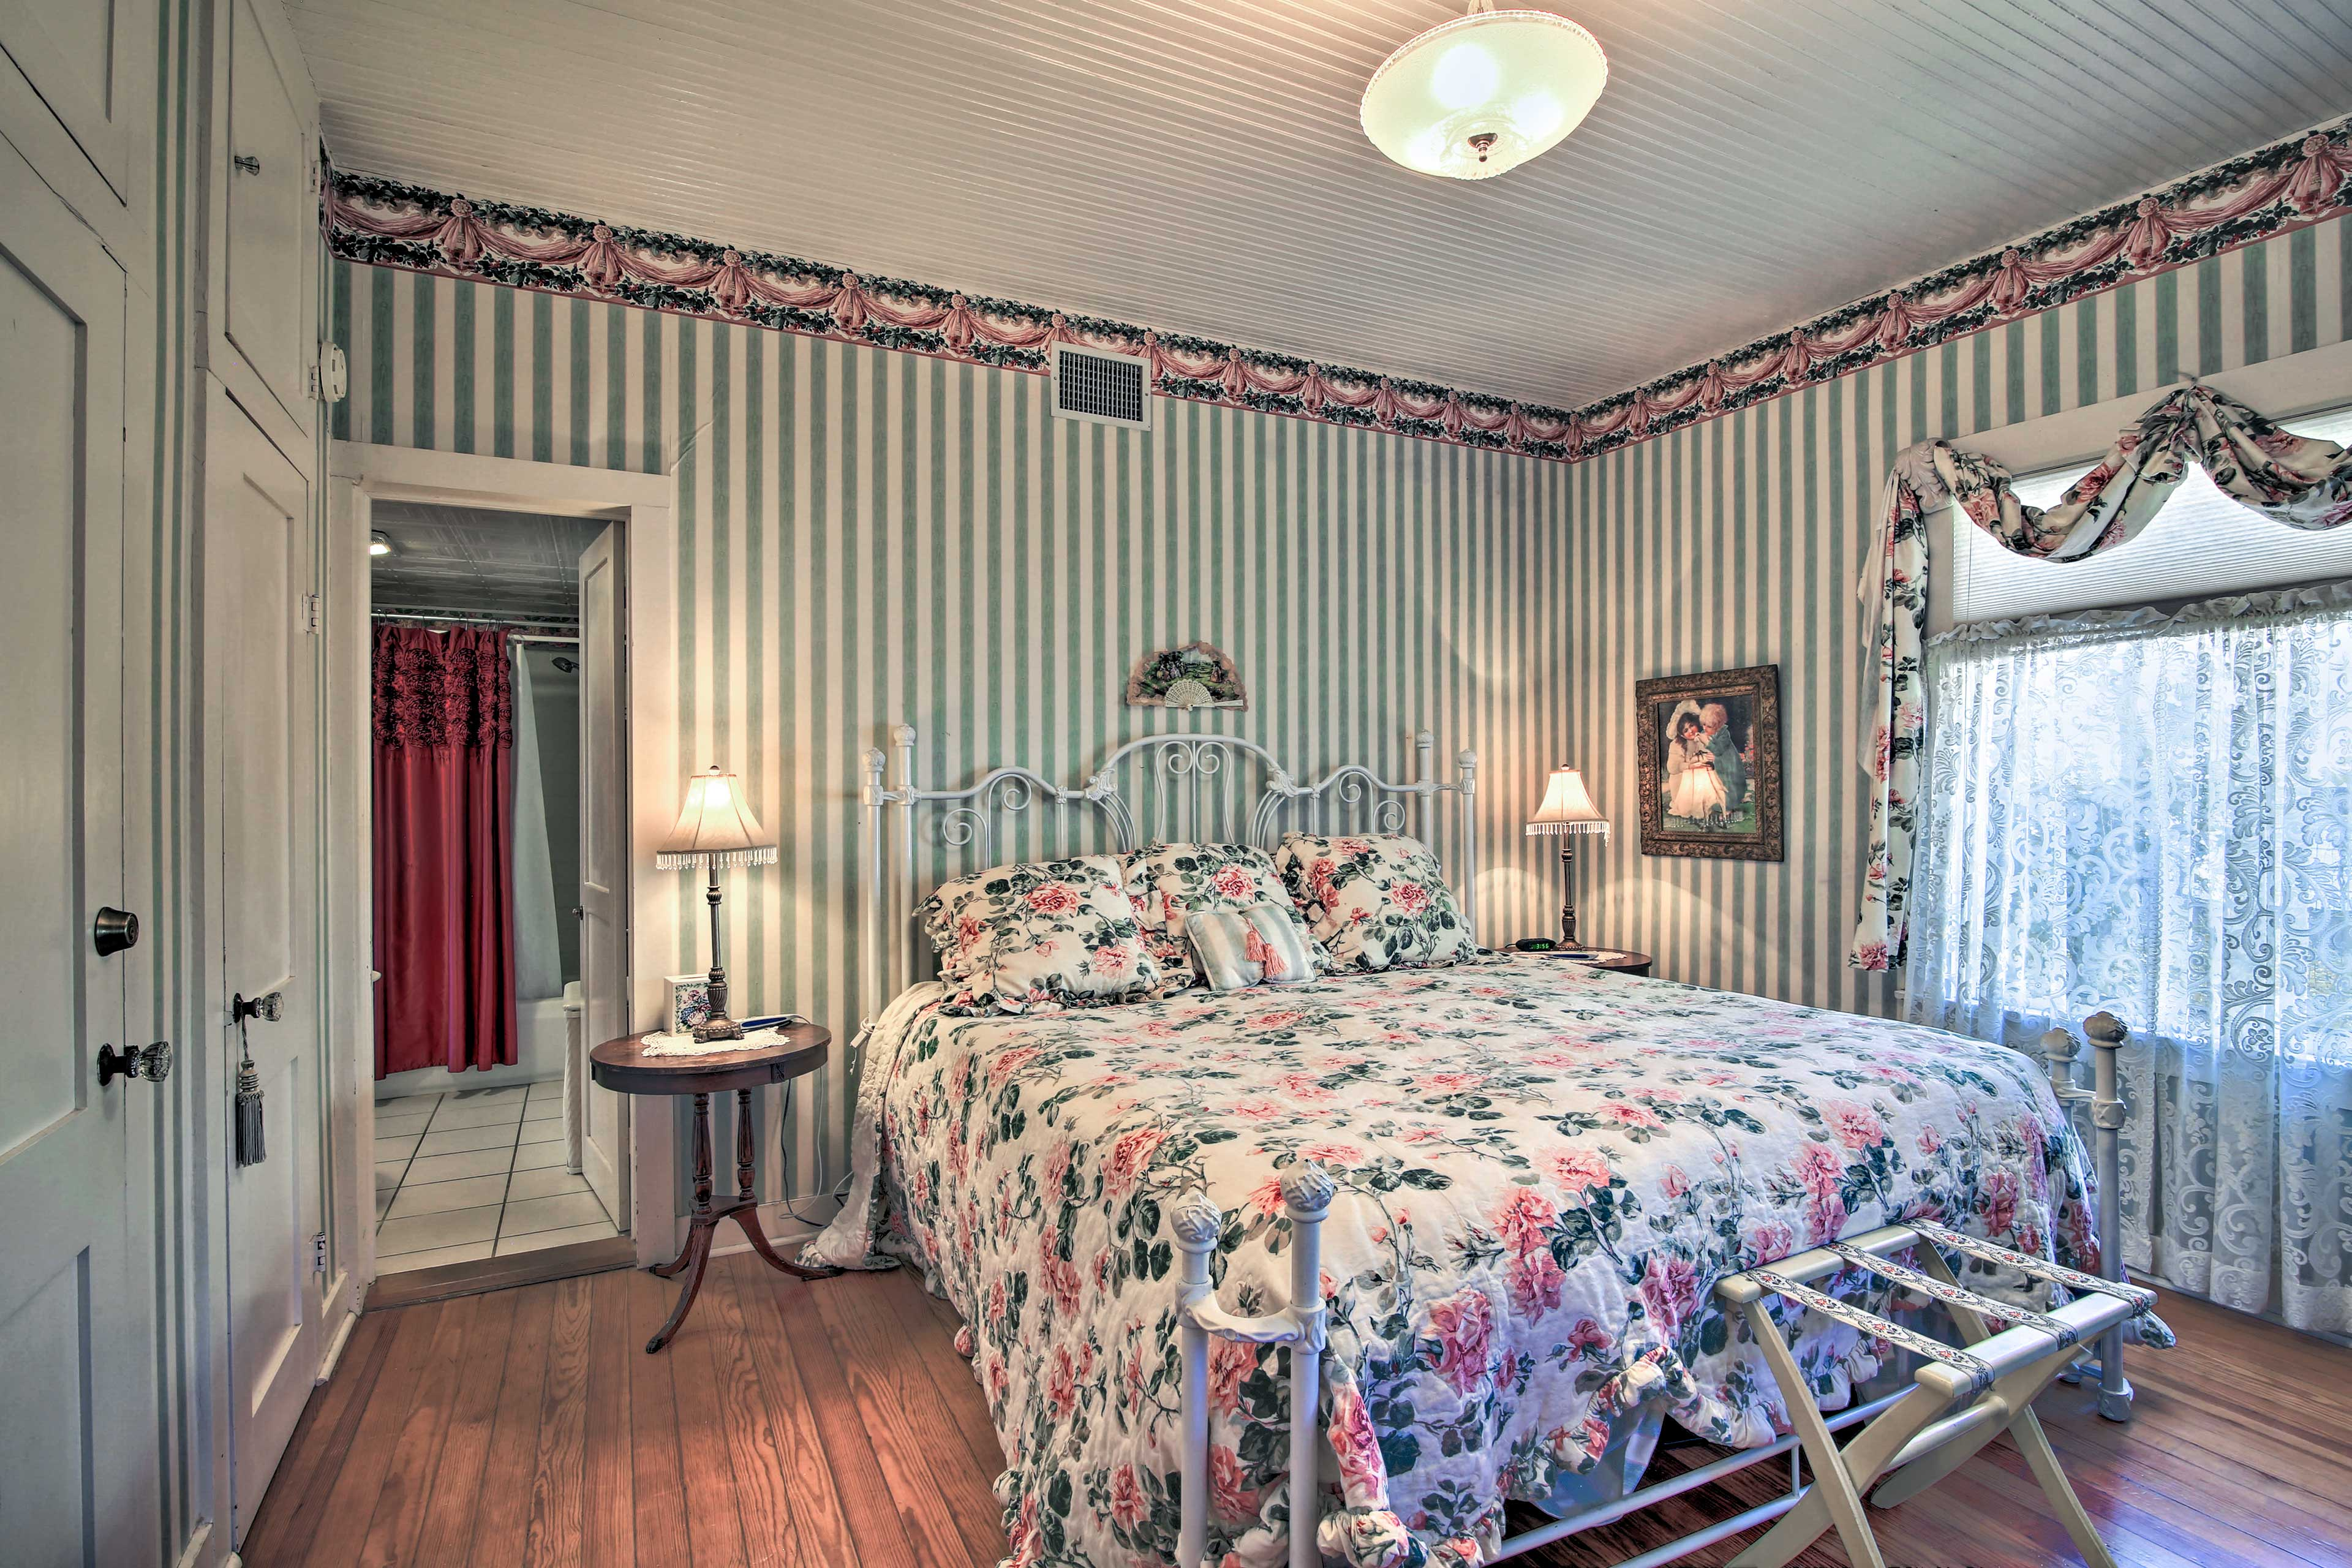 The master bedroom has king-sized Tempurpedic adjustable bed.